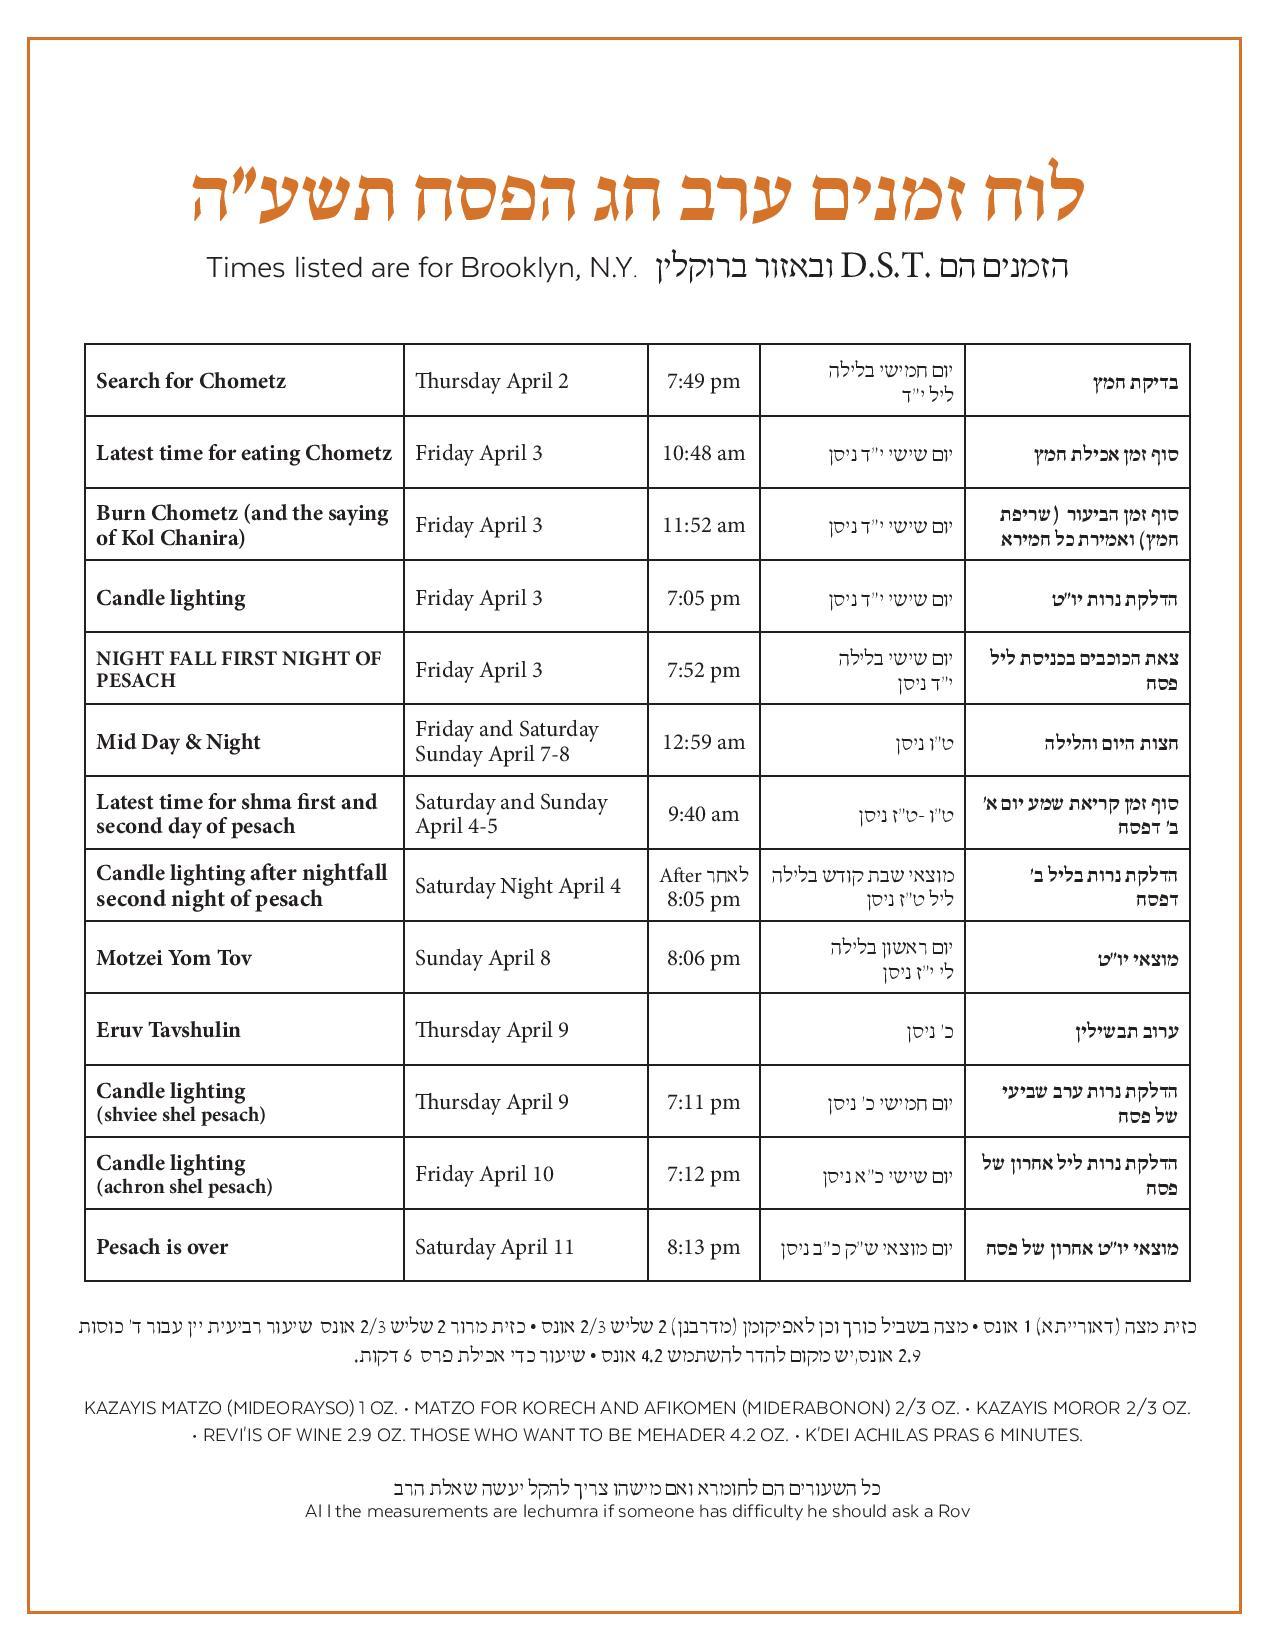 Kosher For Passover Food List